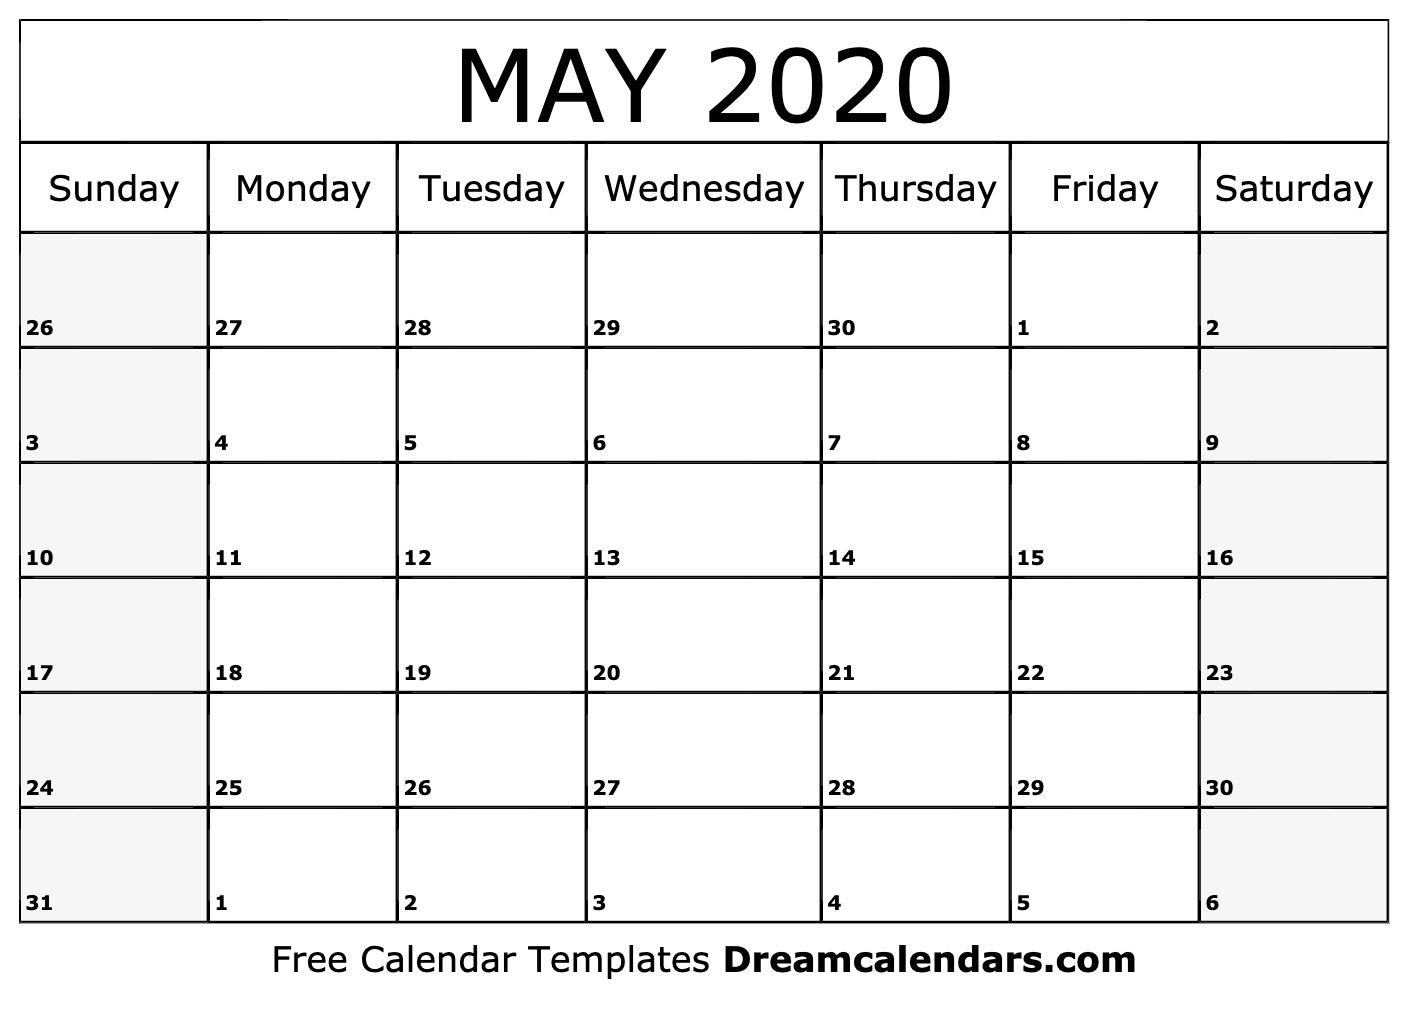 Printable May 2020 Calendar_Blank Calendar May 2020 Pdf